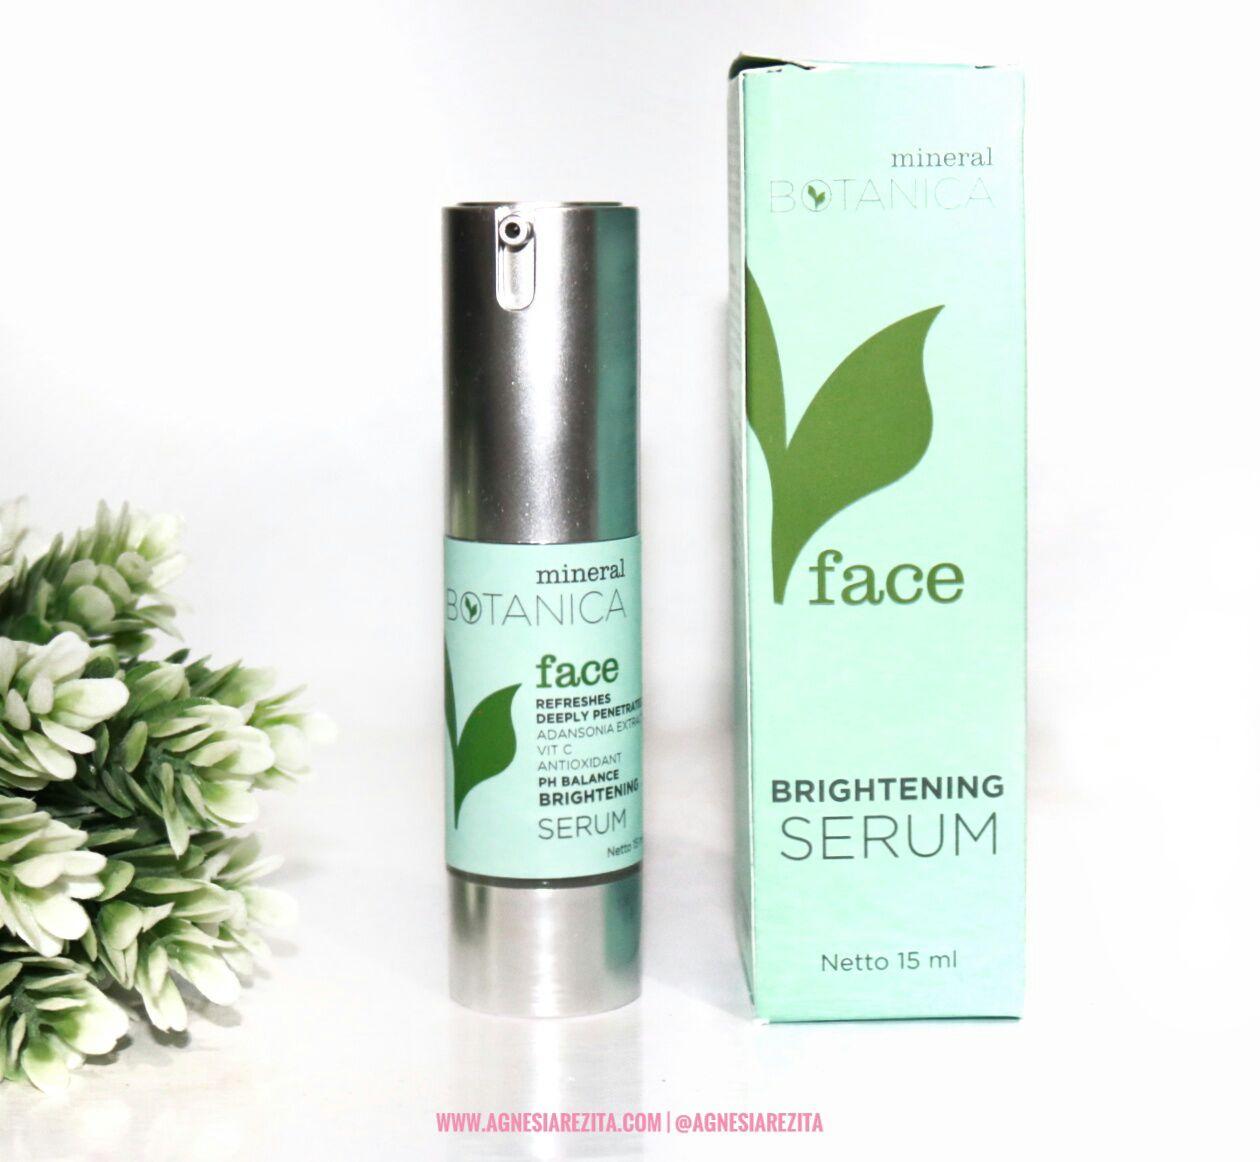 Mineral Botanica Face Brightening Series Micellar Cleansing Water Whitening Plus Complex Day Cream Serum